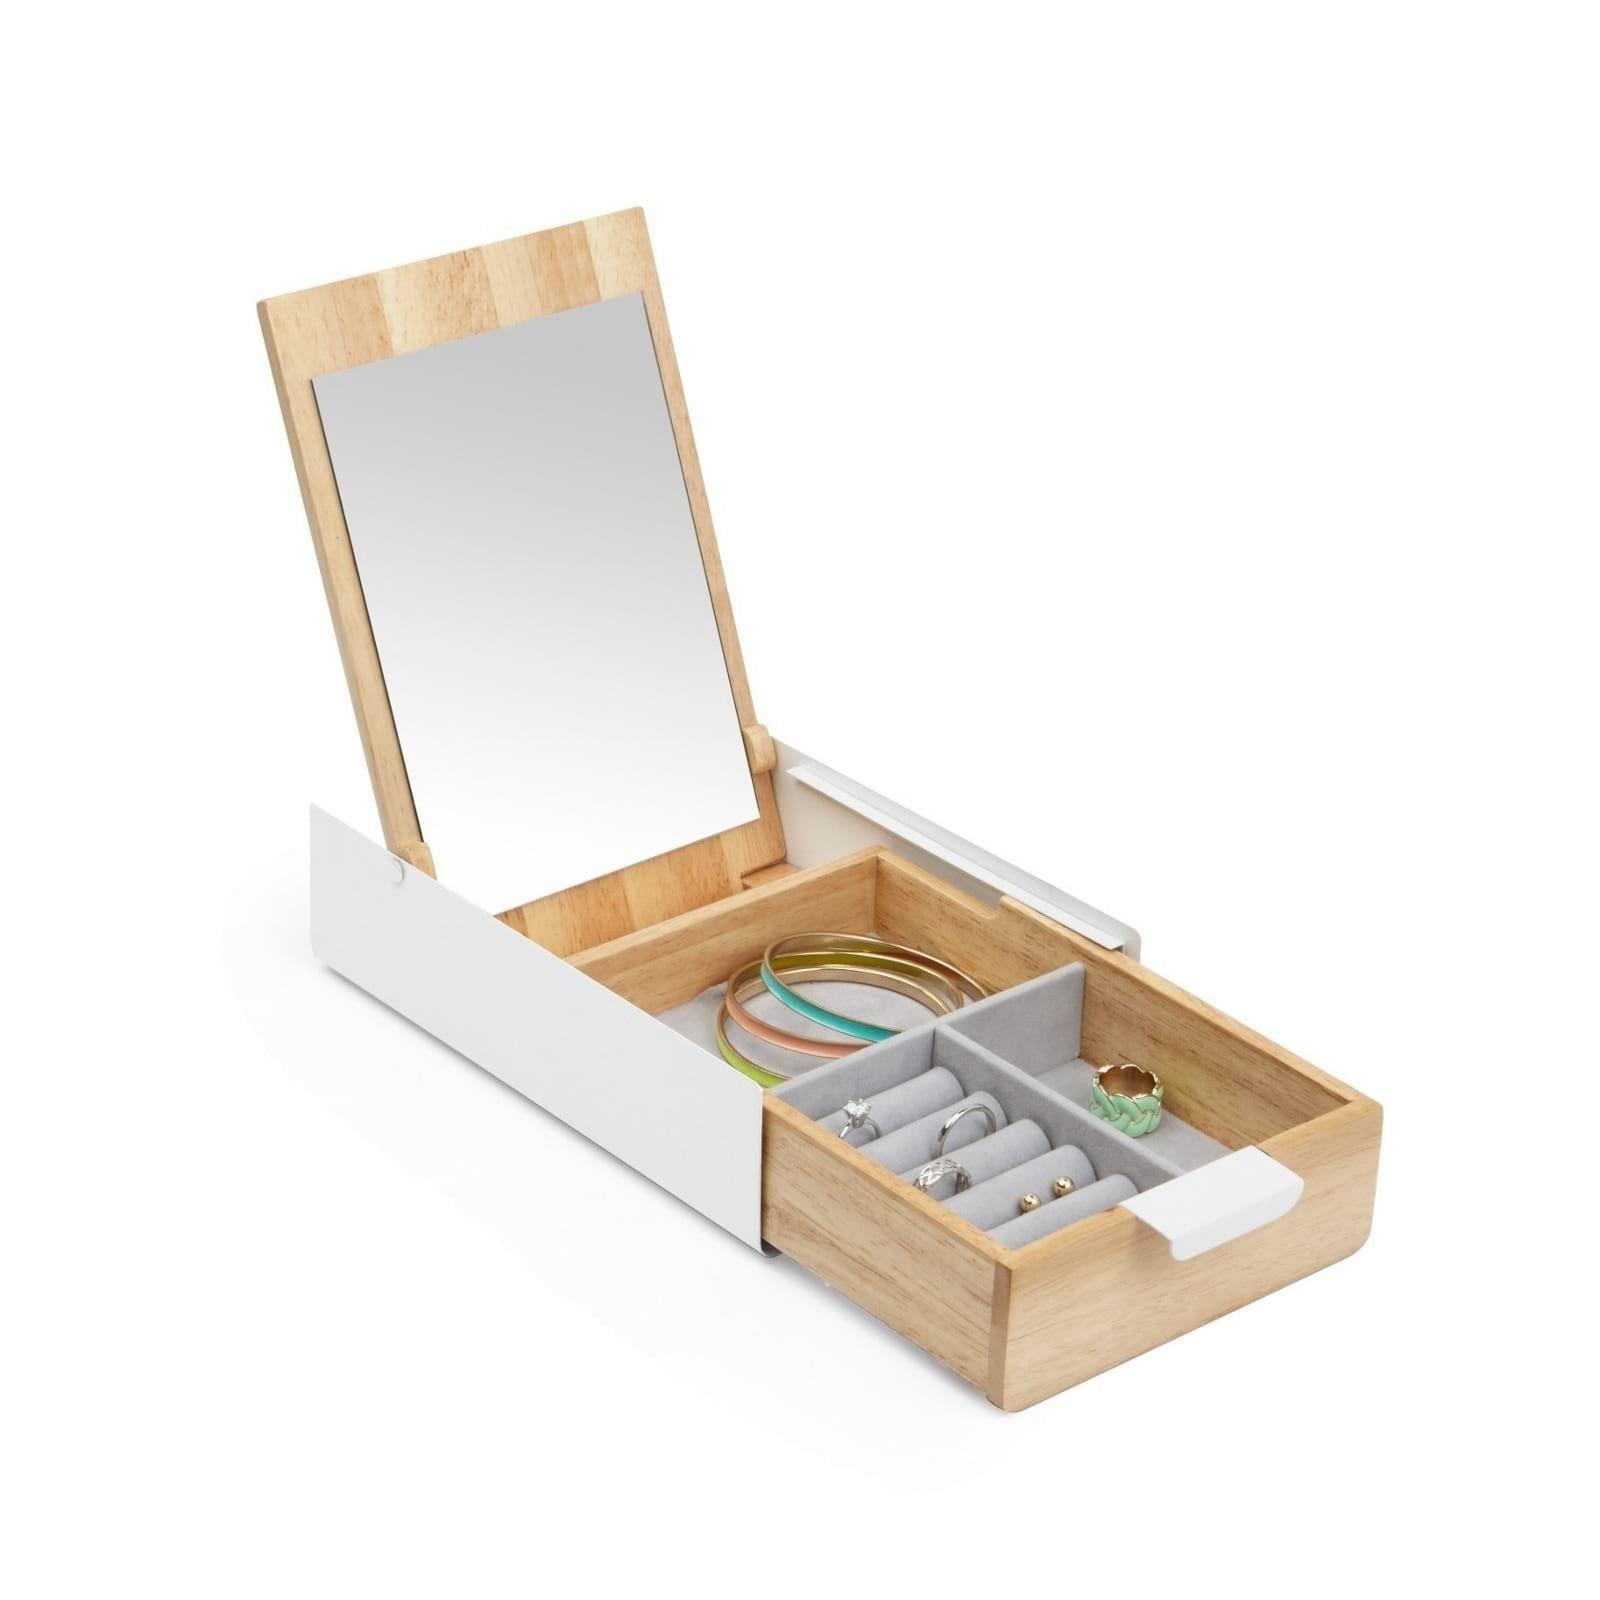 Reflexion Jewelry Storage Box (White / Natural) - Umbra